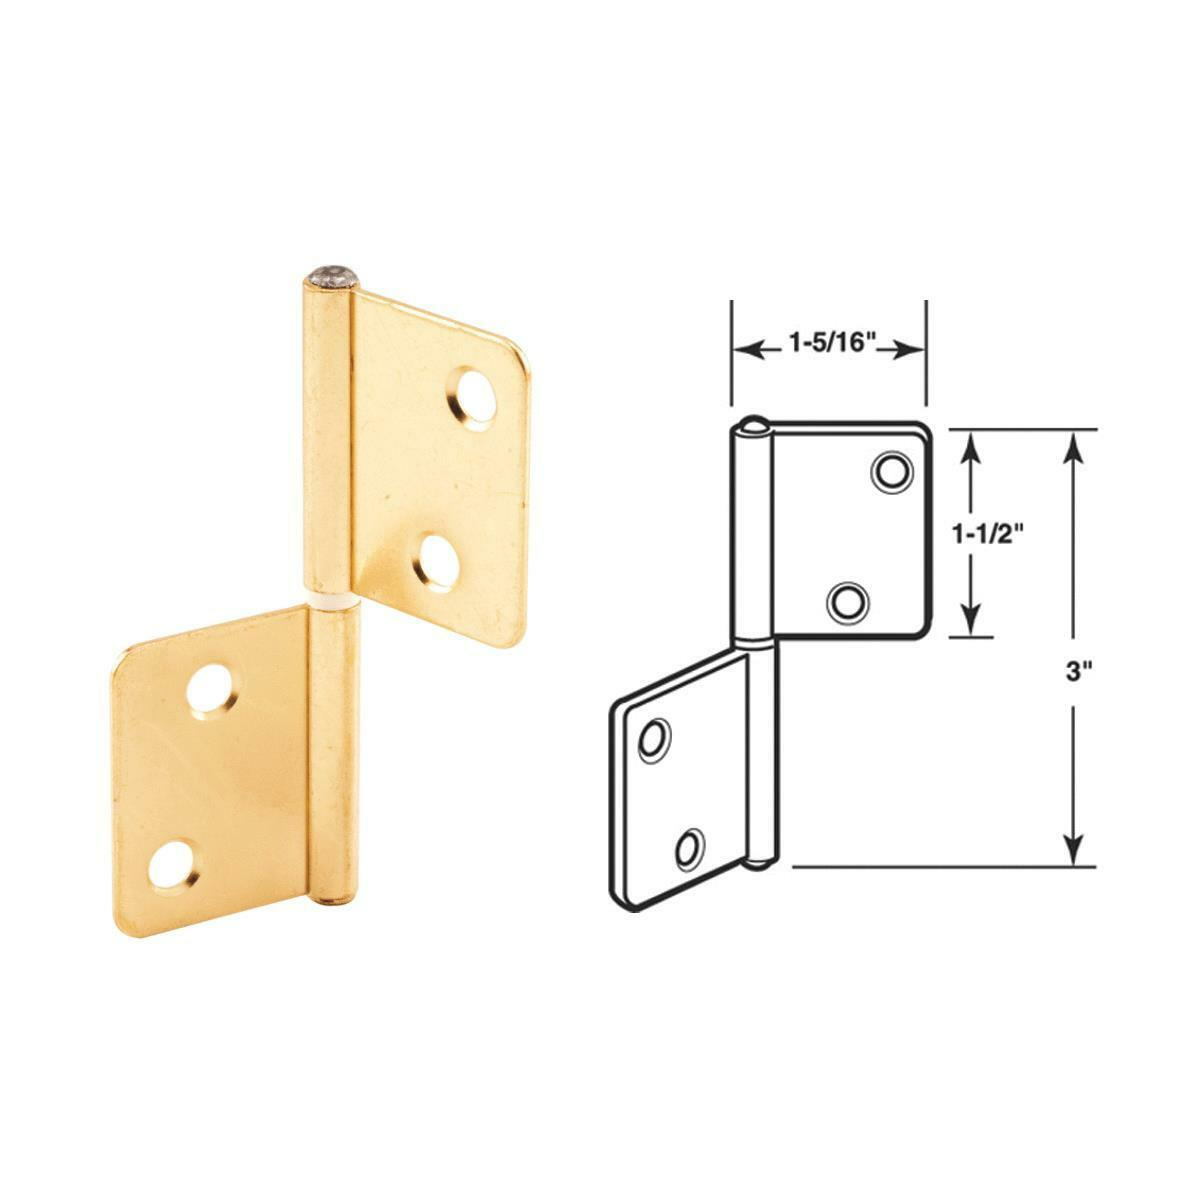 Slide-Co 1932 Adjustable Hinged Shower Door Latch Nylon Tip Stainless Steel